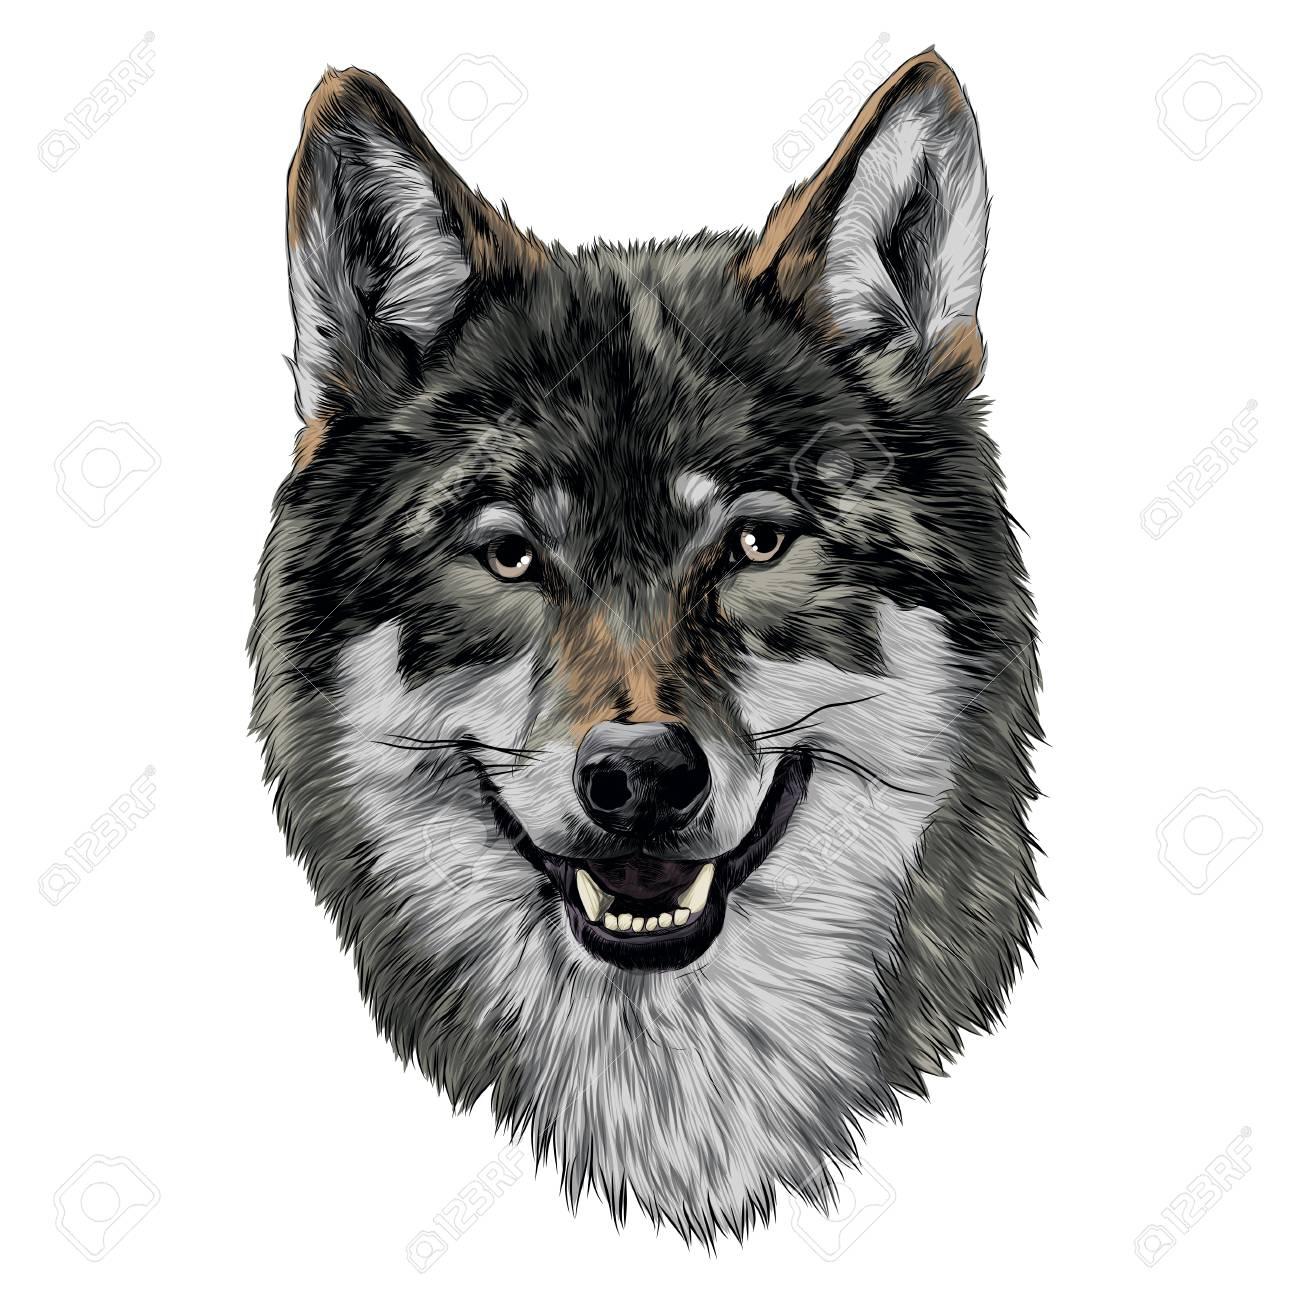 Gráfico De Cabeza De Vector De Dibujo De Cabeza De Lobo